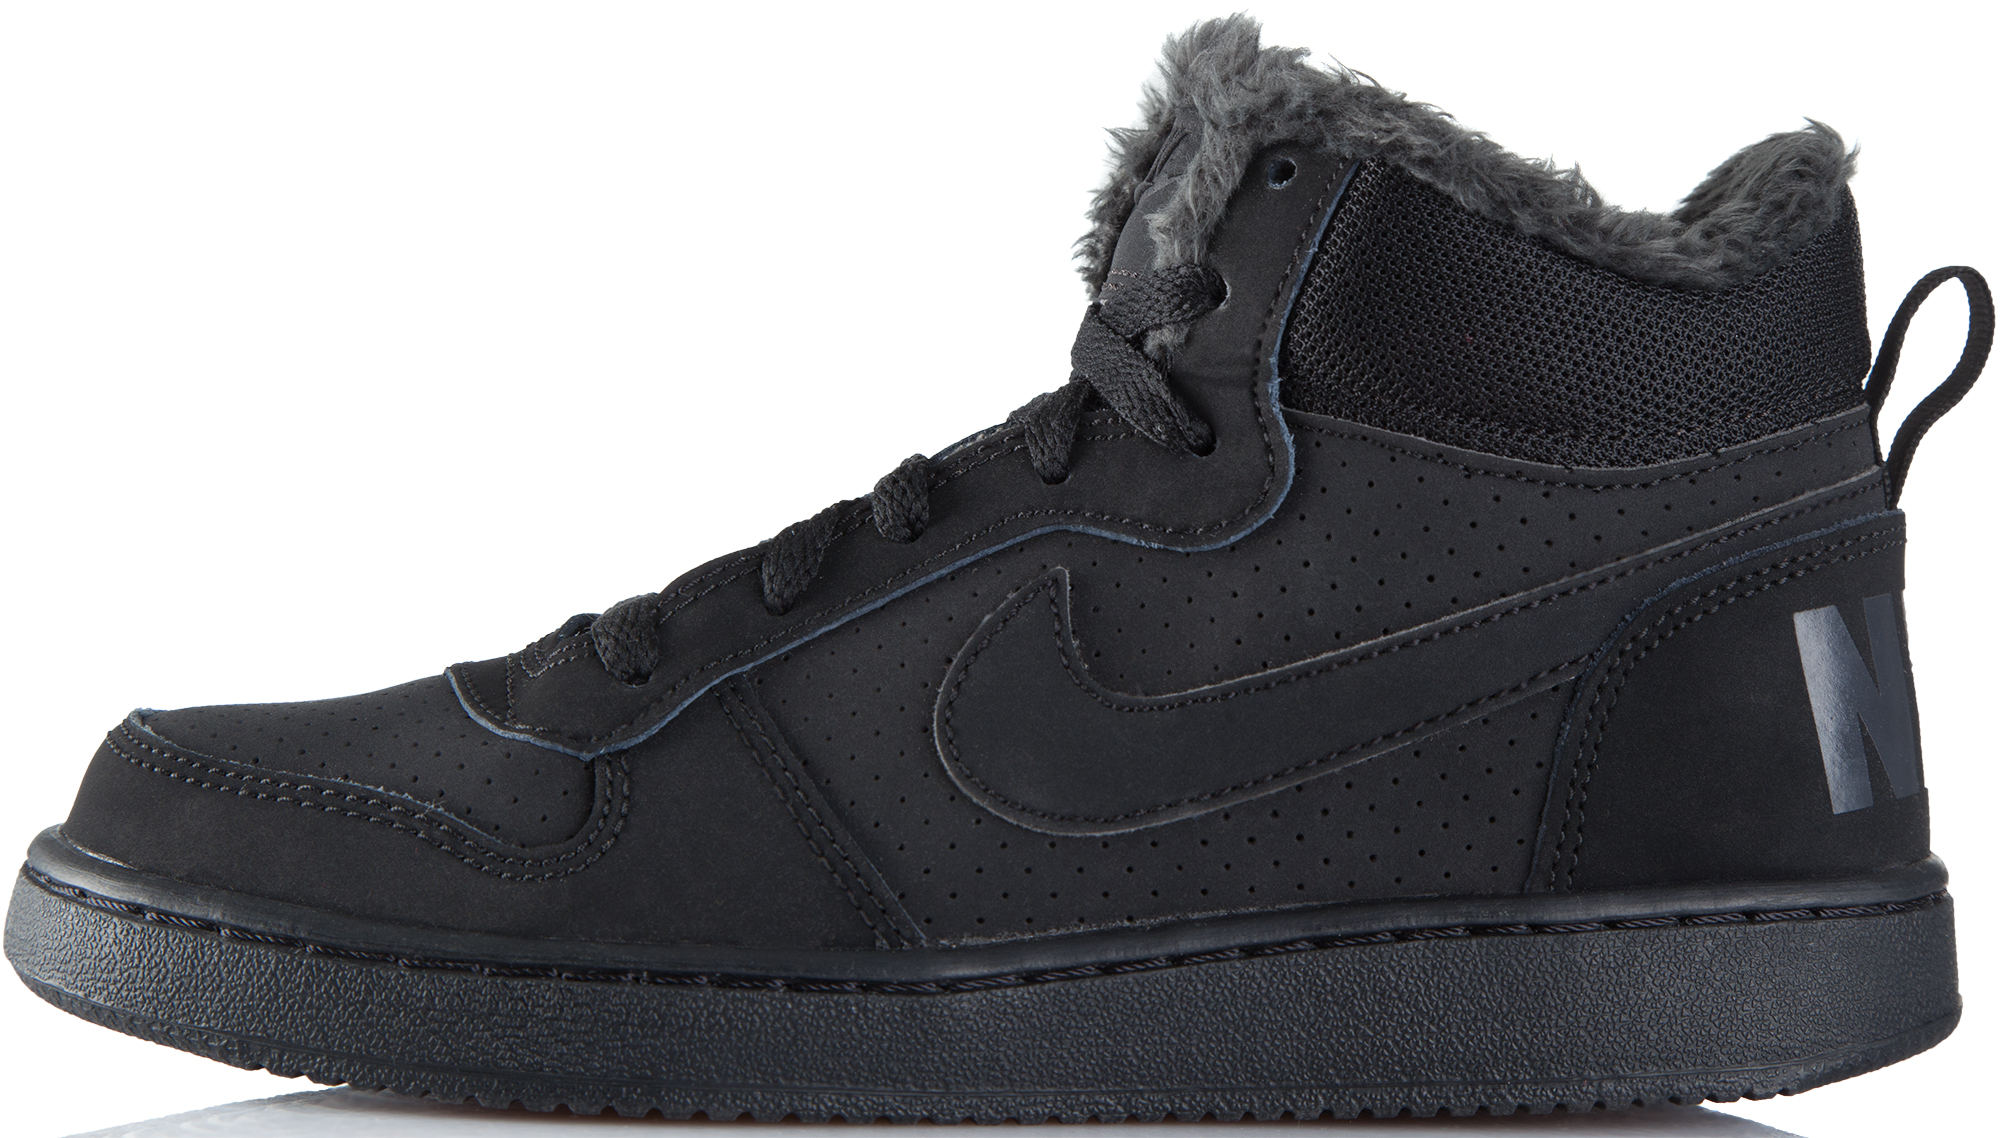 Nike Кеды для мальчиков  Court Borough Mid Winter, размер 39